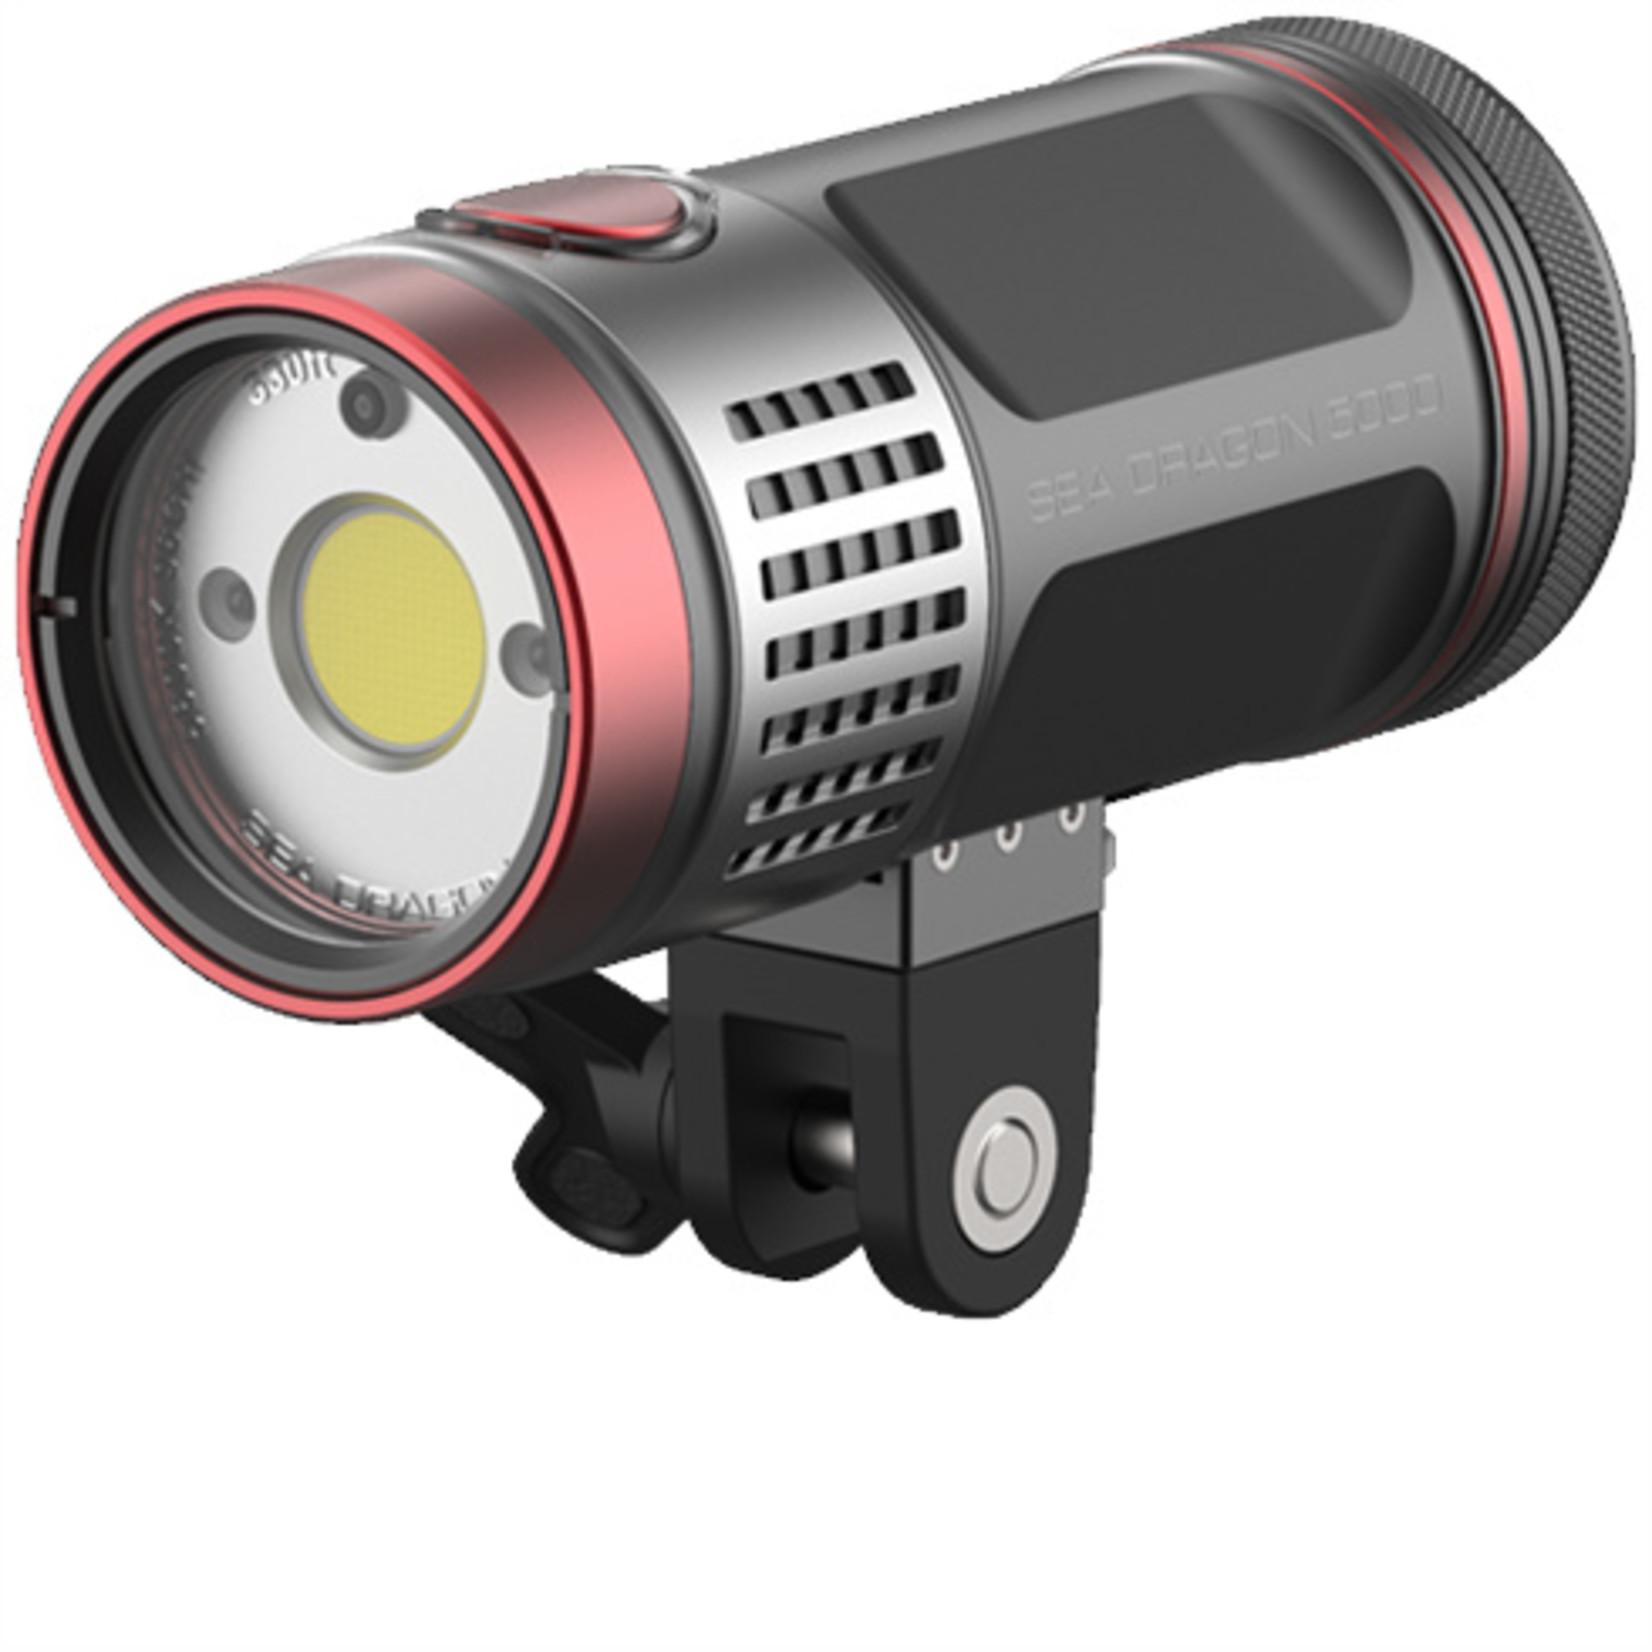 Sealife Sea Dragon 5000 Auto UW Photo-Video Light Head (incl. YS Mount, battery&charger)